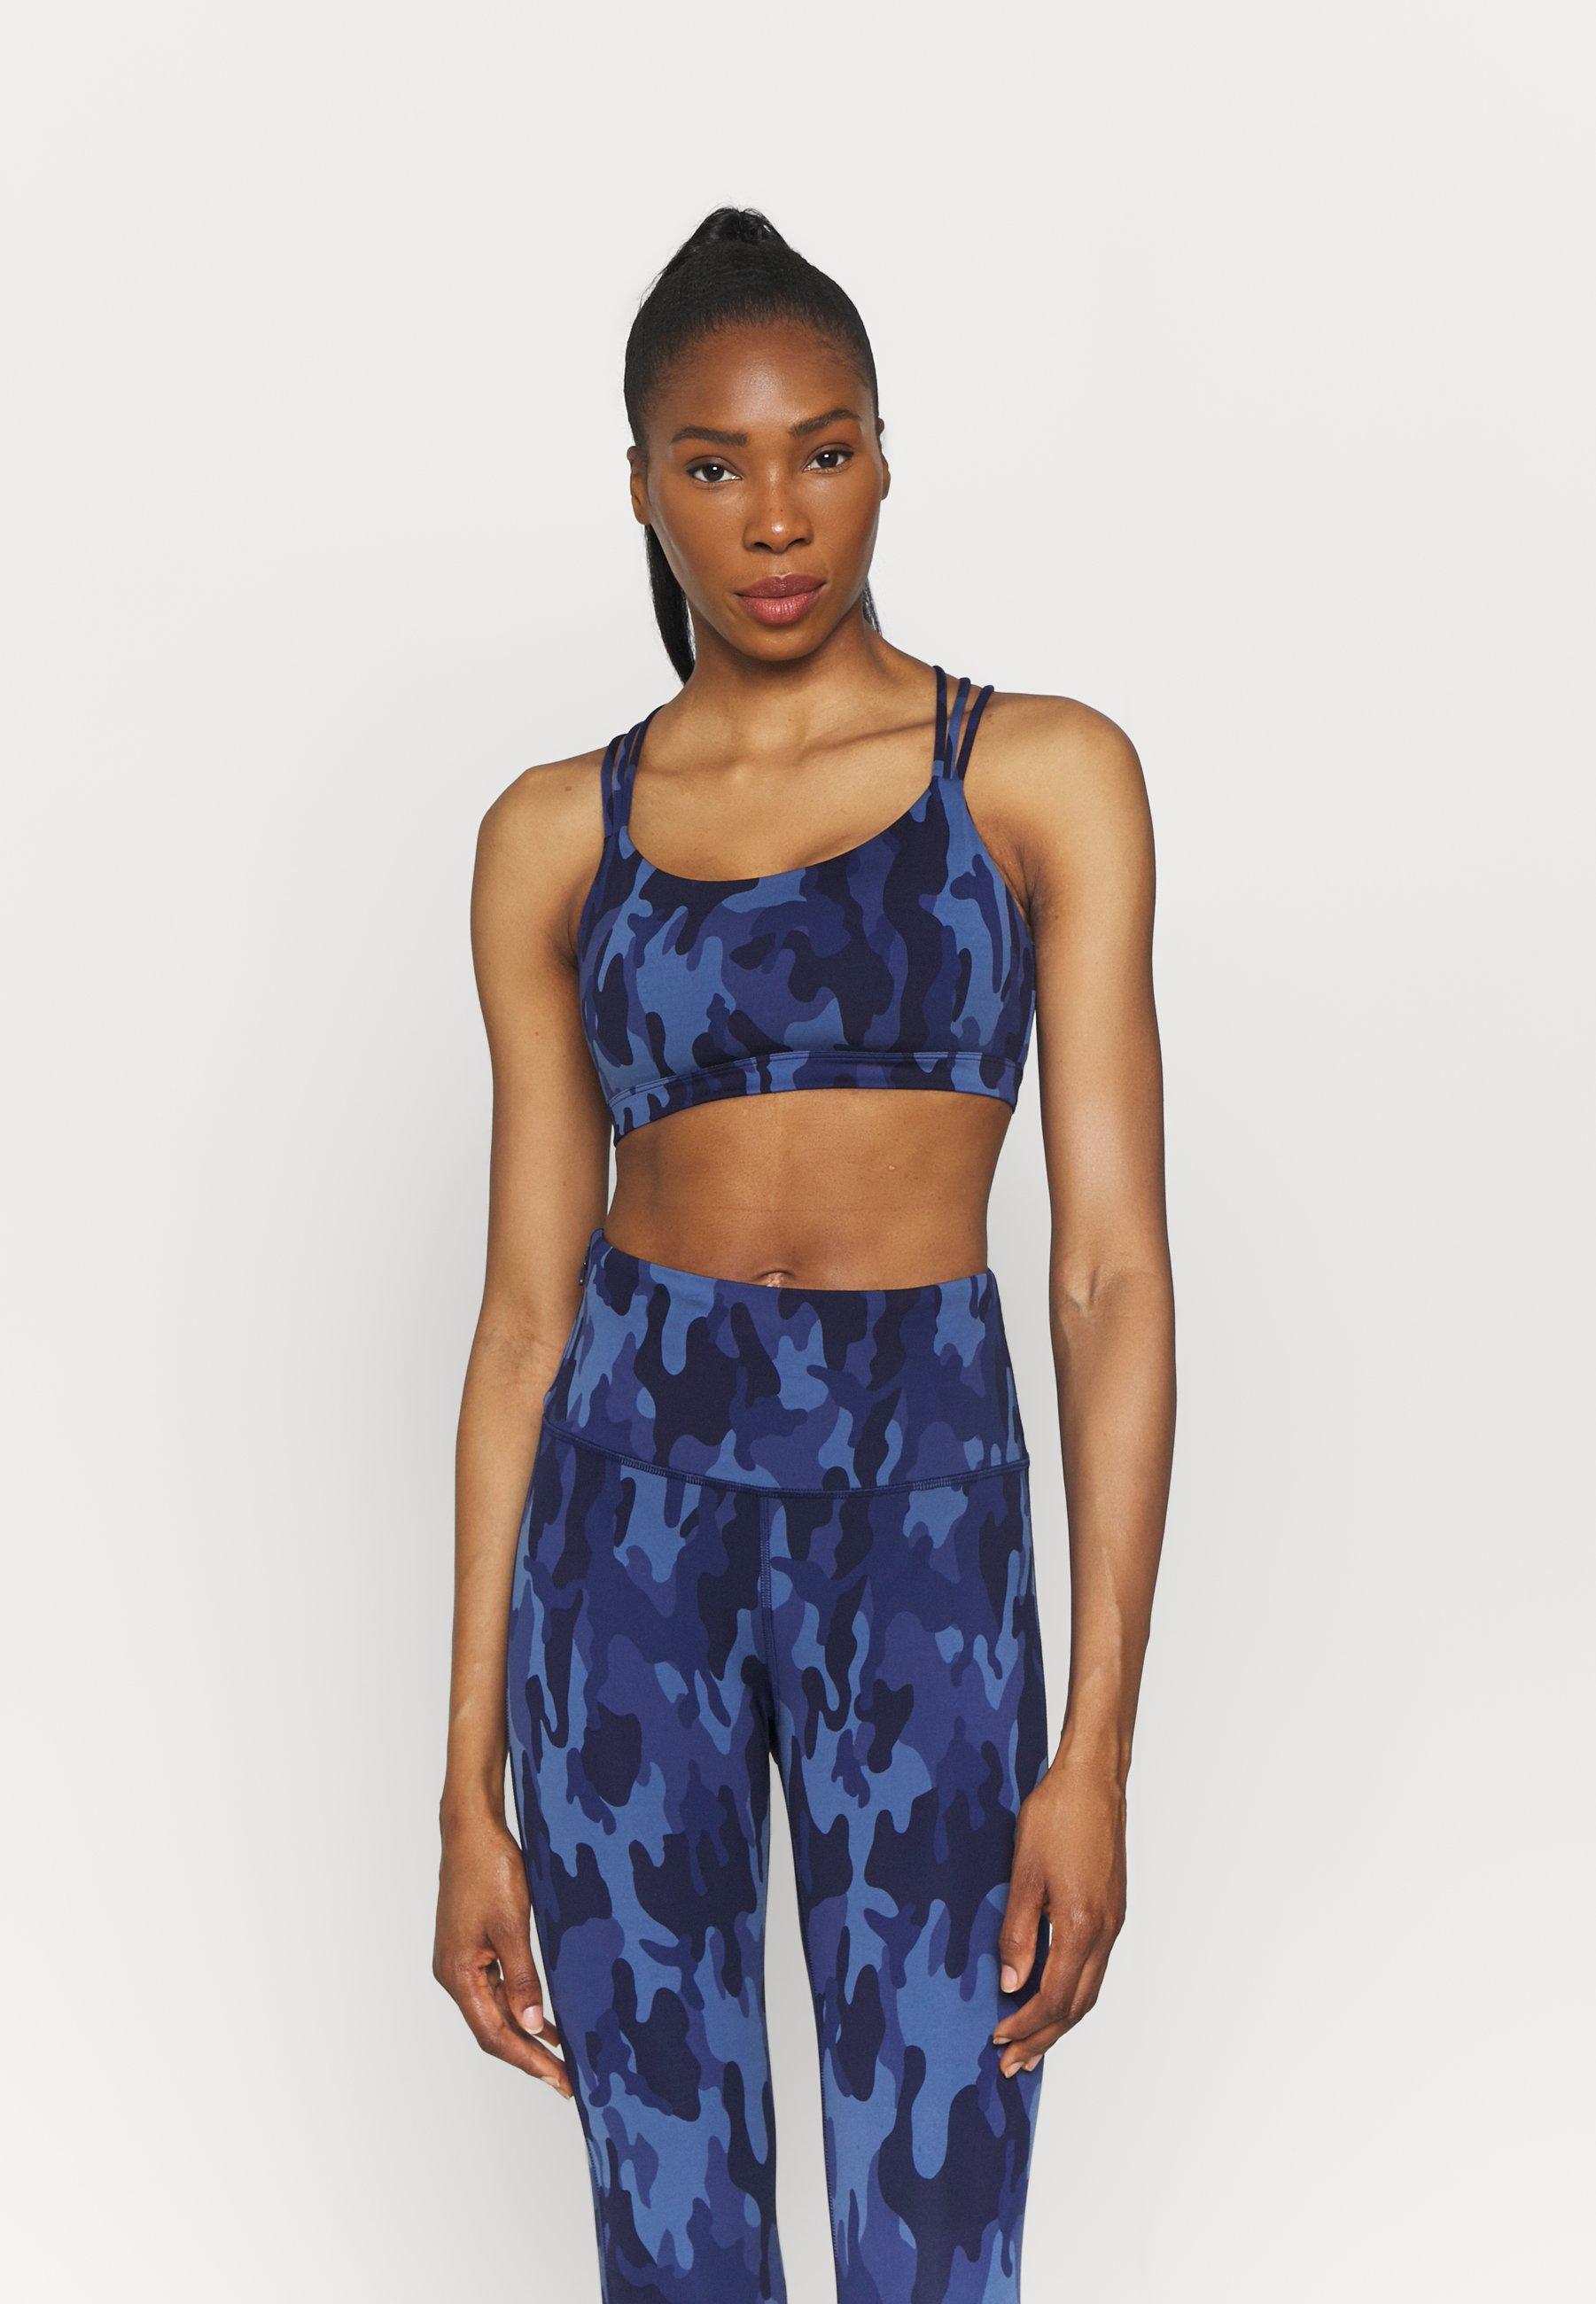 Women ECLIPSE STRAPPY BACK - Medium support sports bra - blue